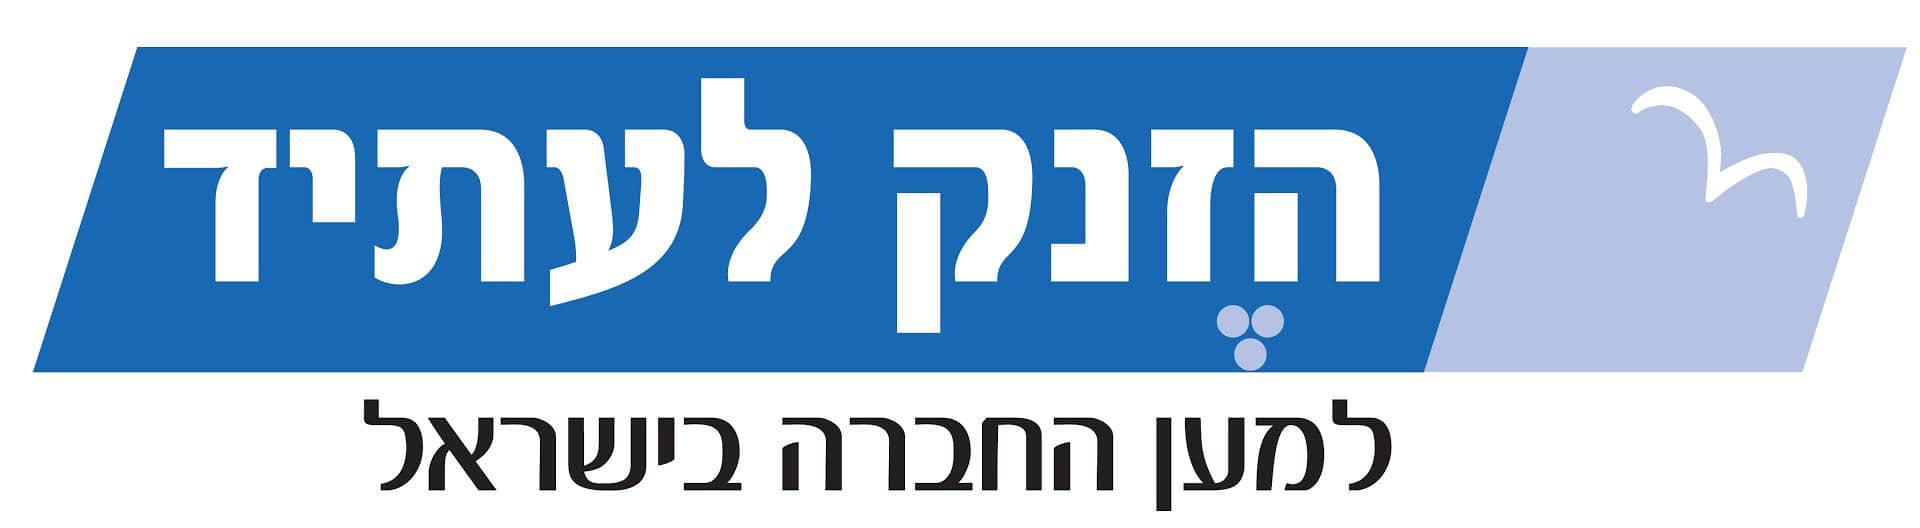 heznek_logo